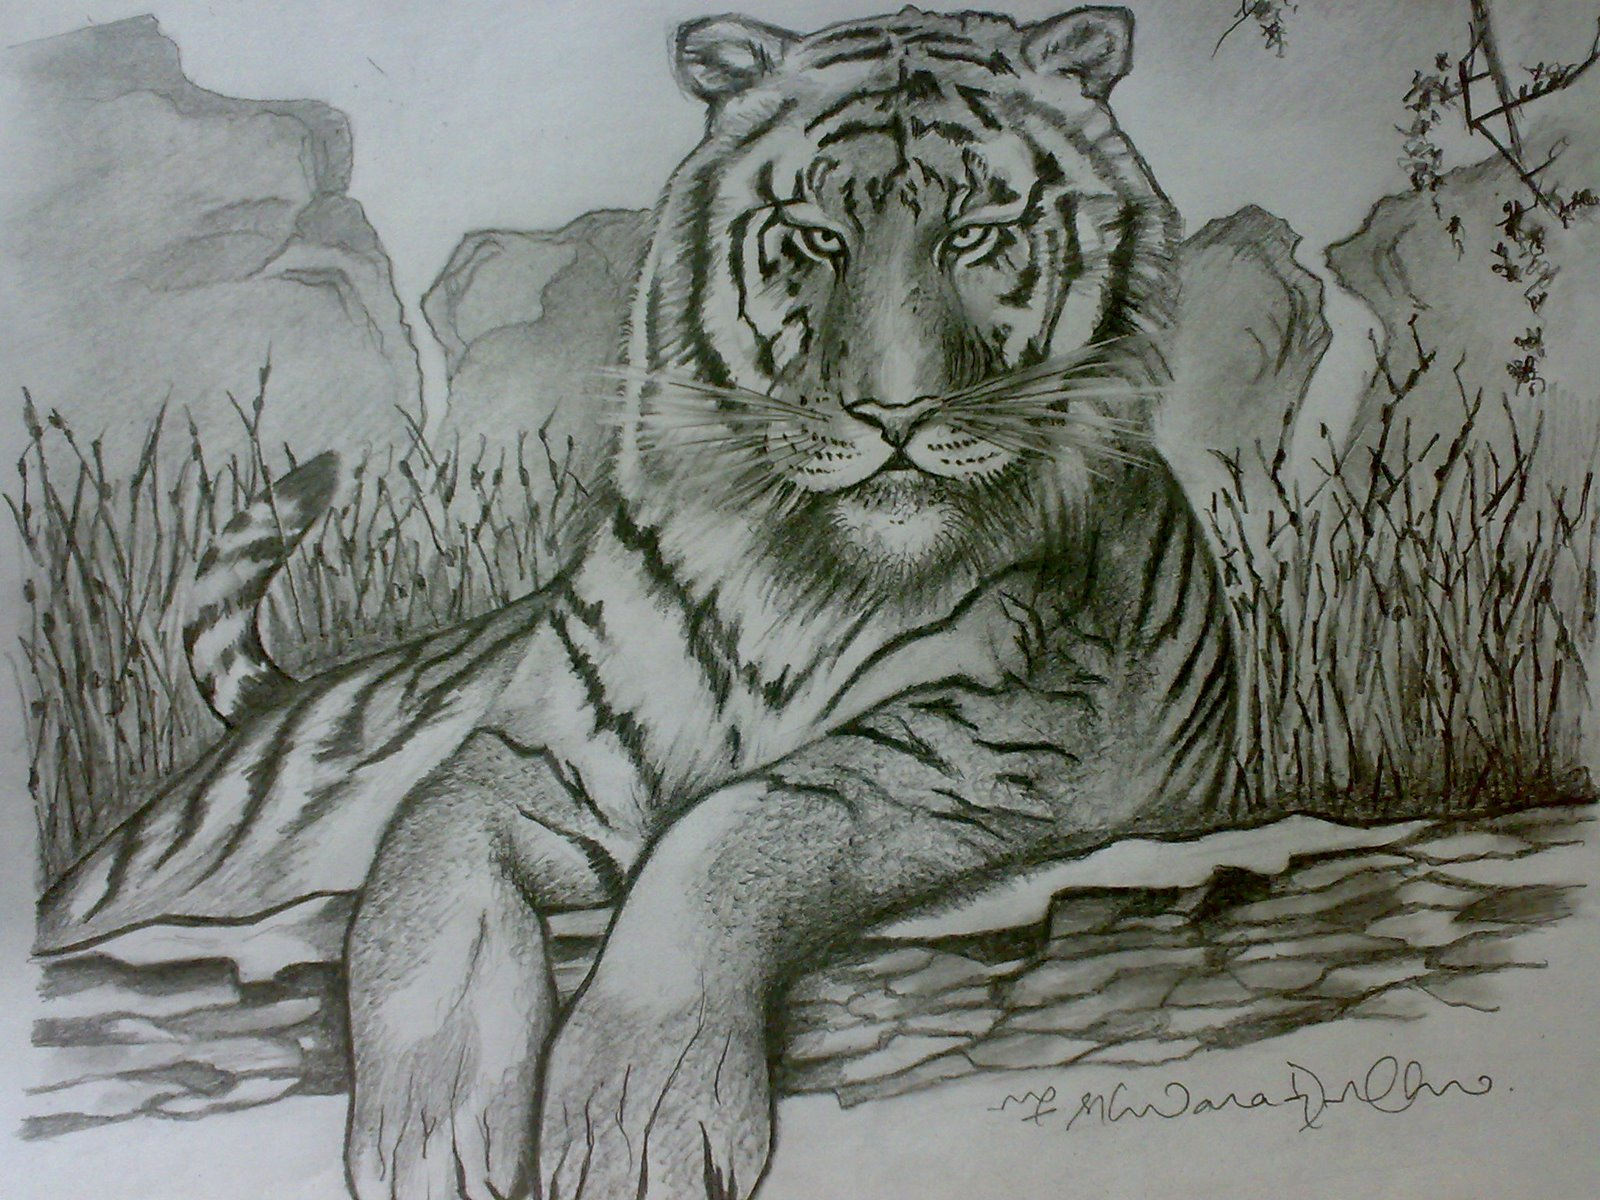 Tigre Sketch: Ferrocious Feline